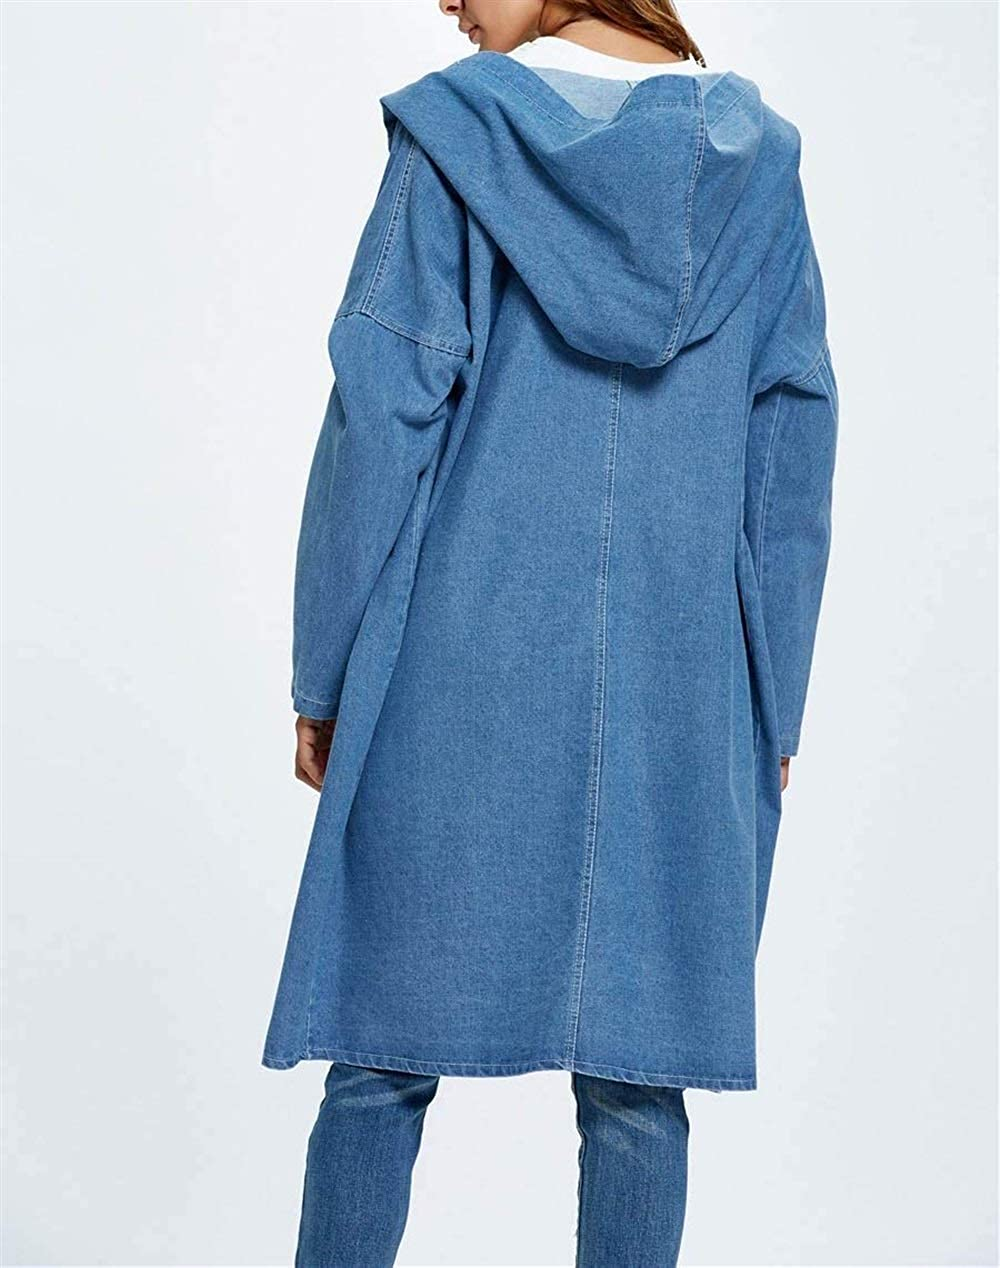 Jeansjacke Damen Lang Elegant Freizeit Mit Kapuze Jeansmantel Mantel Blau Bekleidung Frühling Herbst Relaxed Jungen Trend Mode Longsleeve Coat Outerwear Hellblau